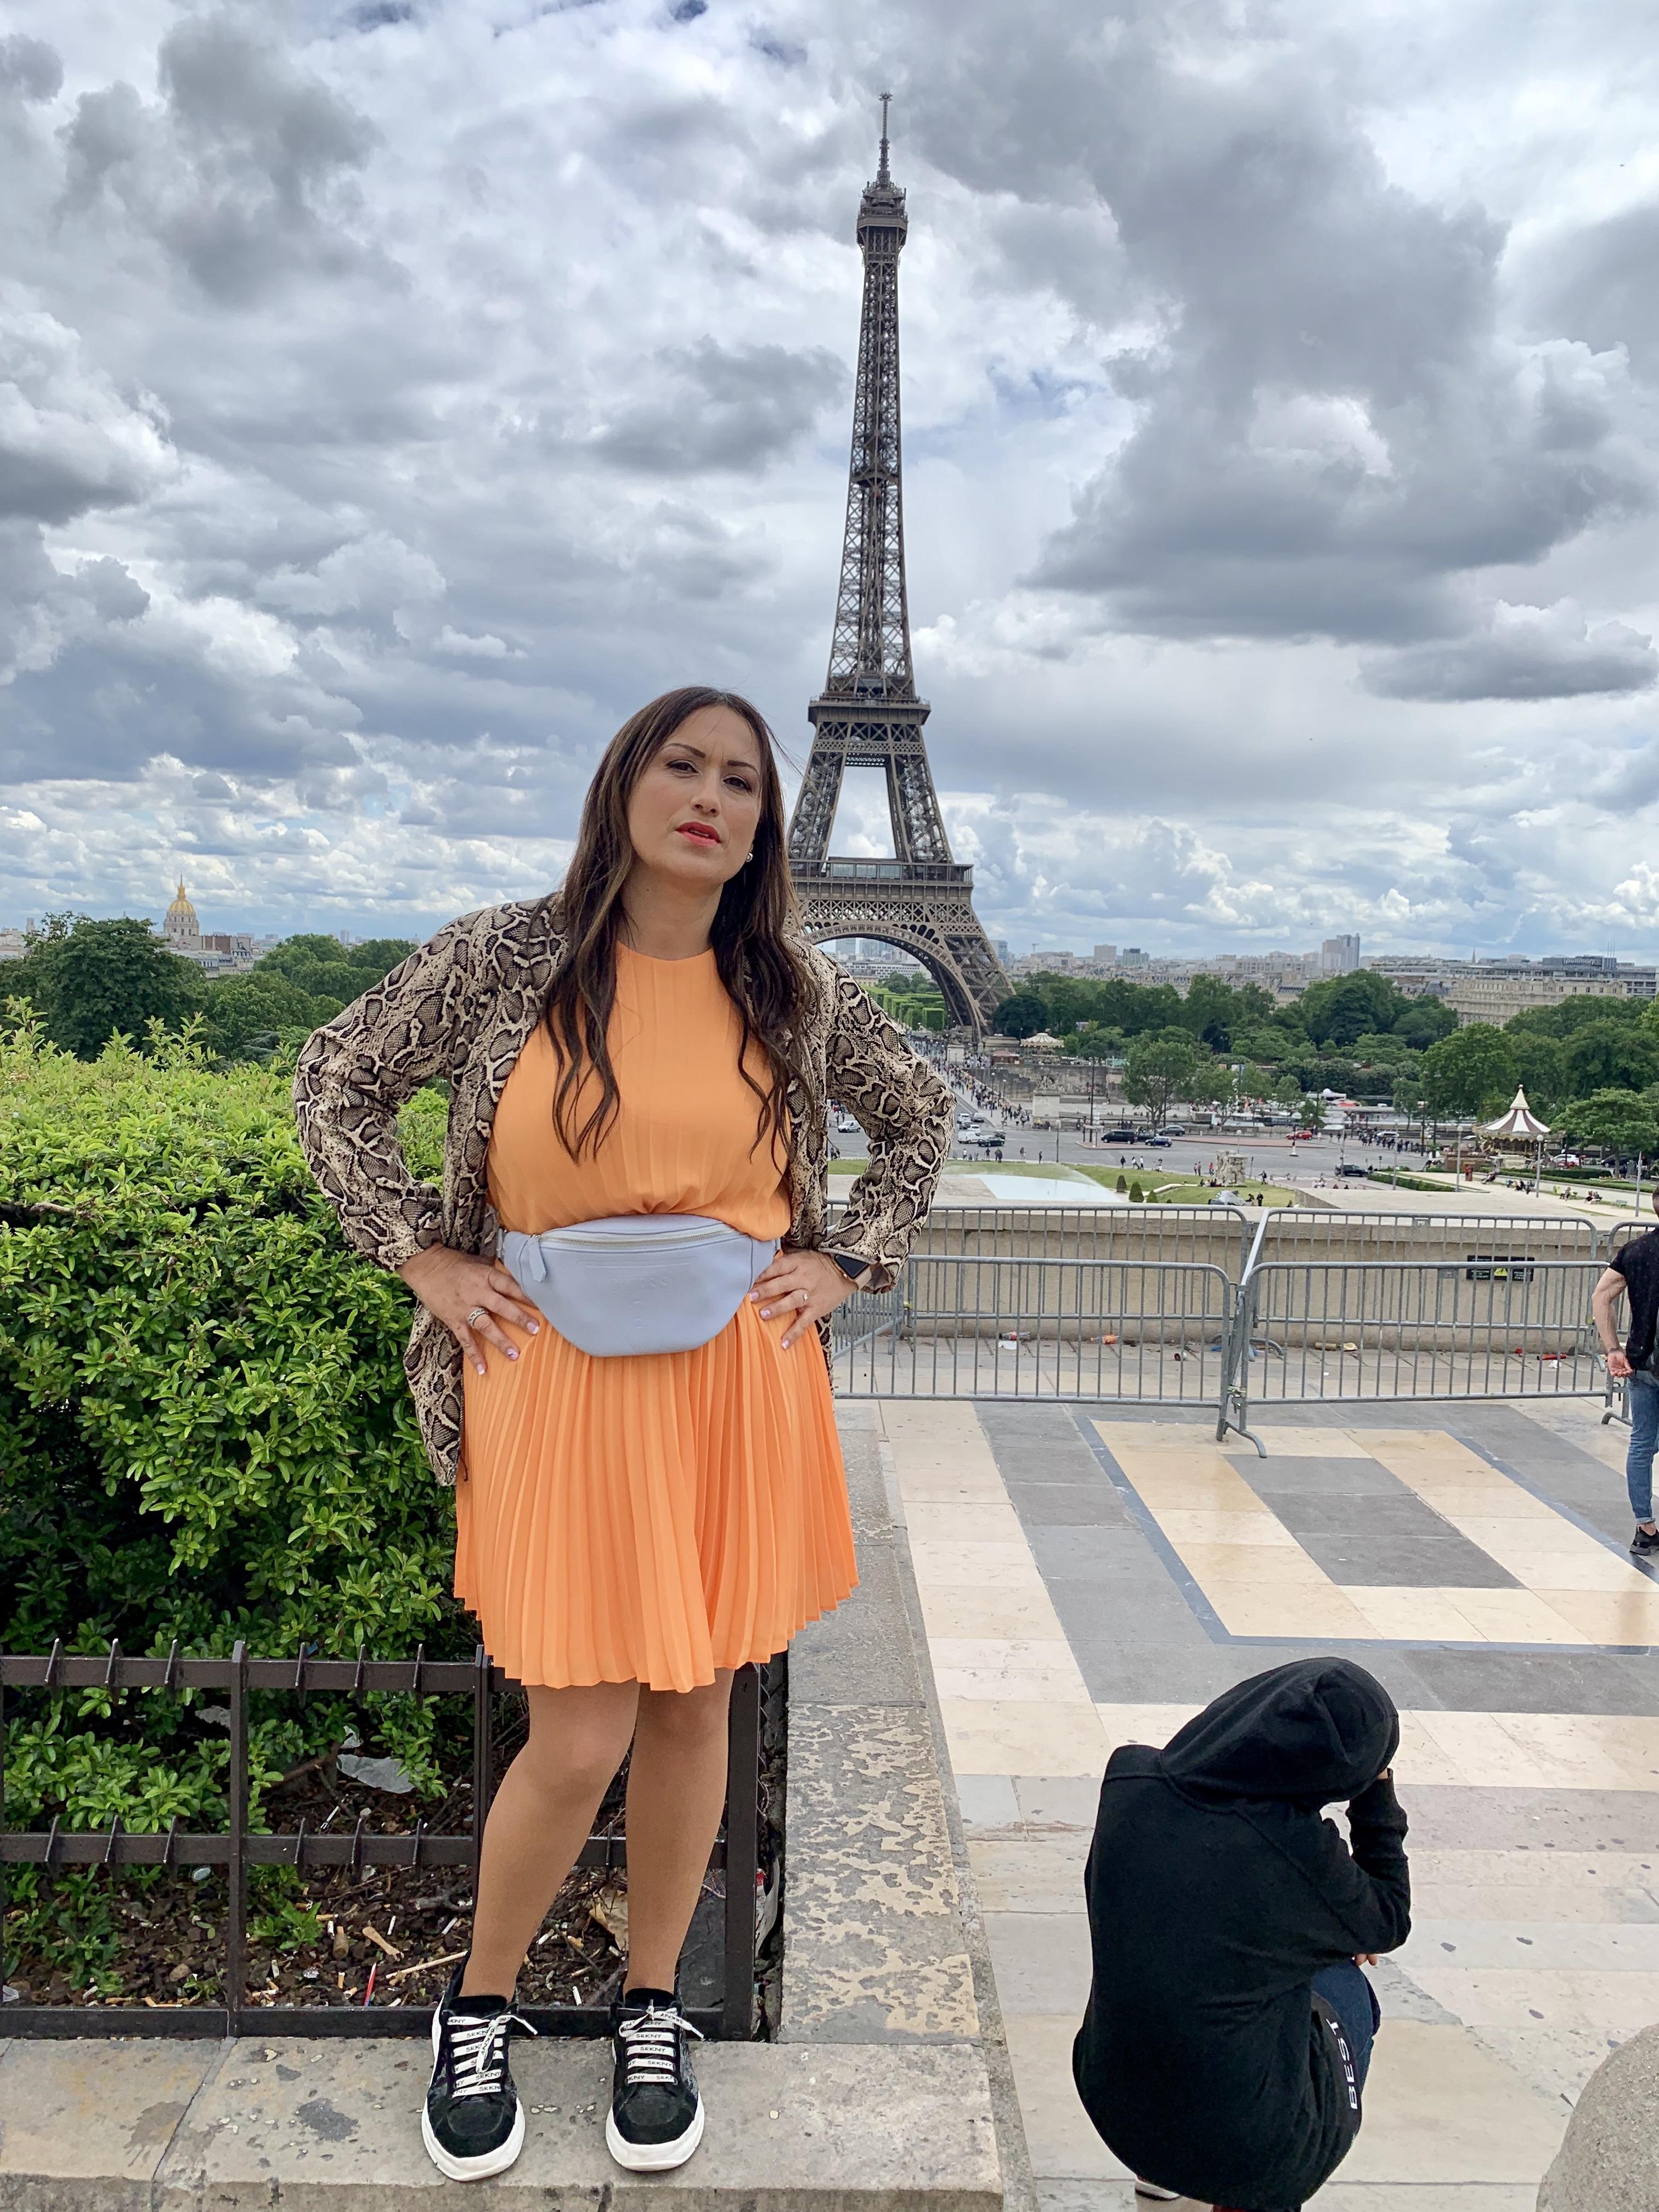 Whynot-shopper-blogger-vestido-naranja-plisado-moda-tendencia-primavera-verano-2019-riñonera-blazer-snake-animal-print-paris